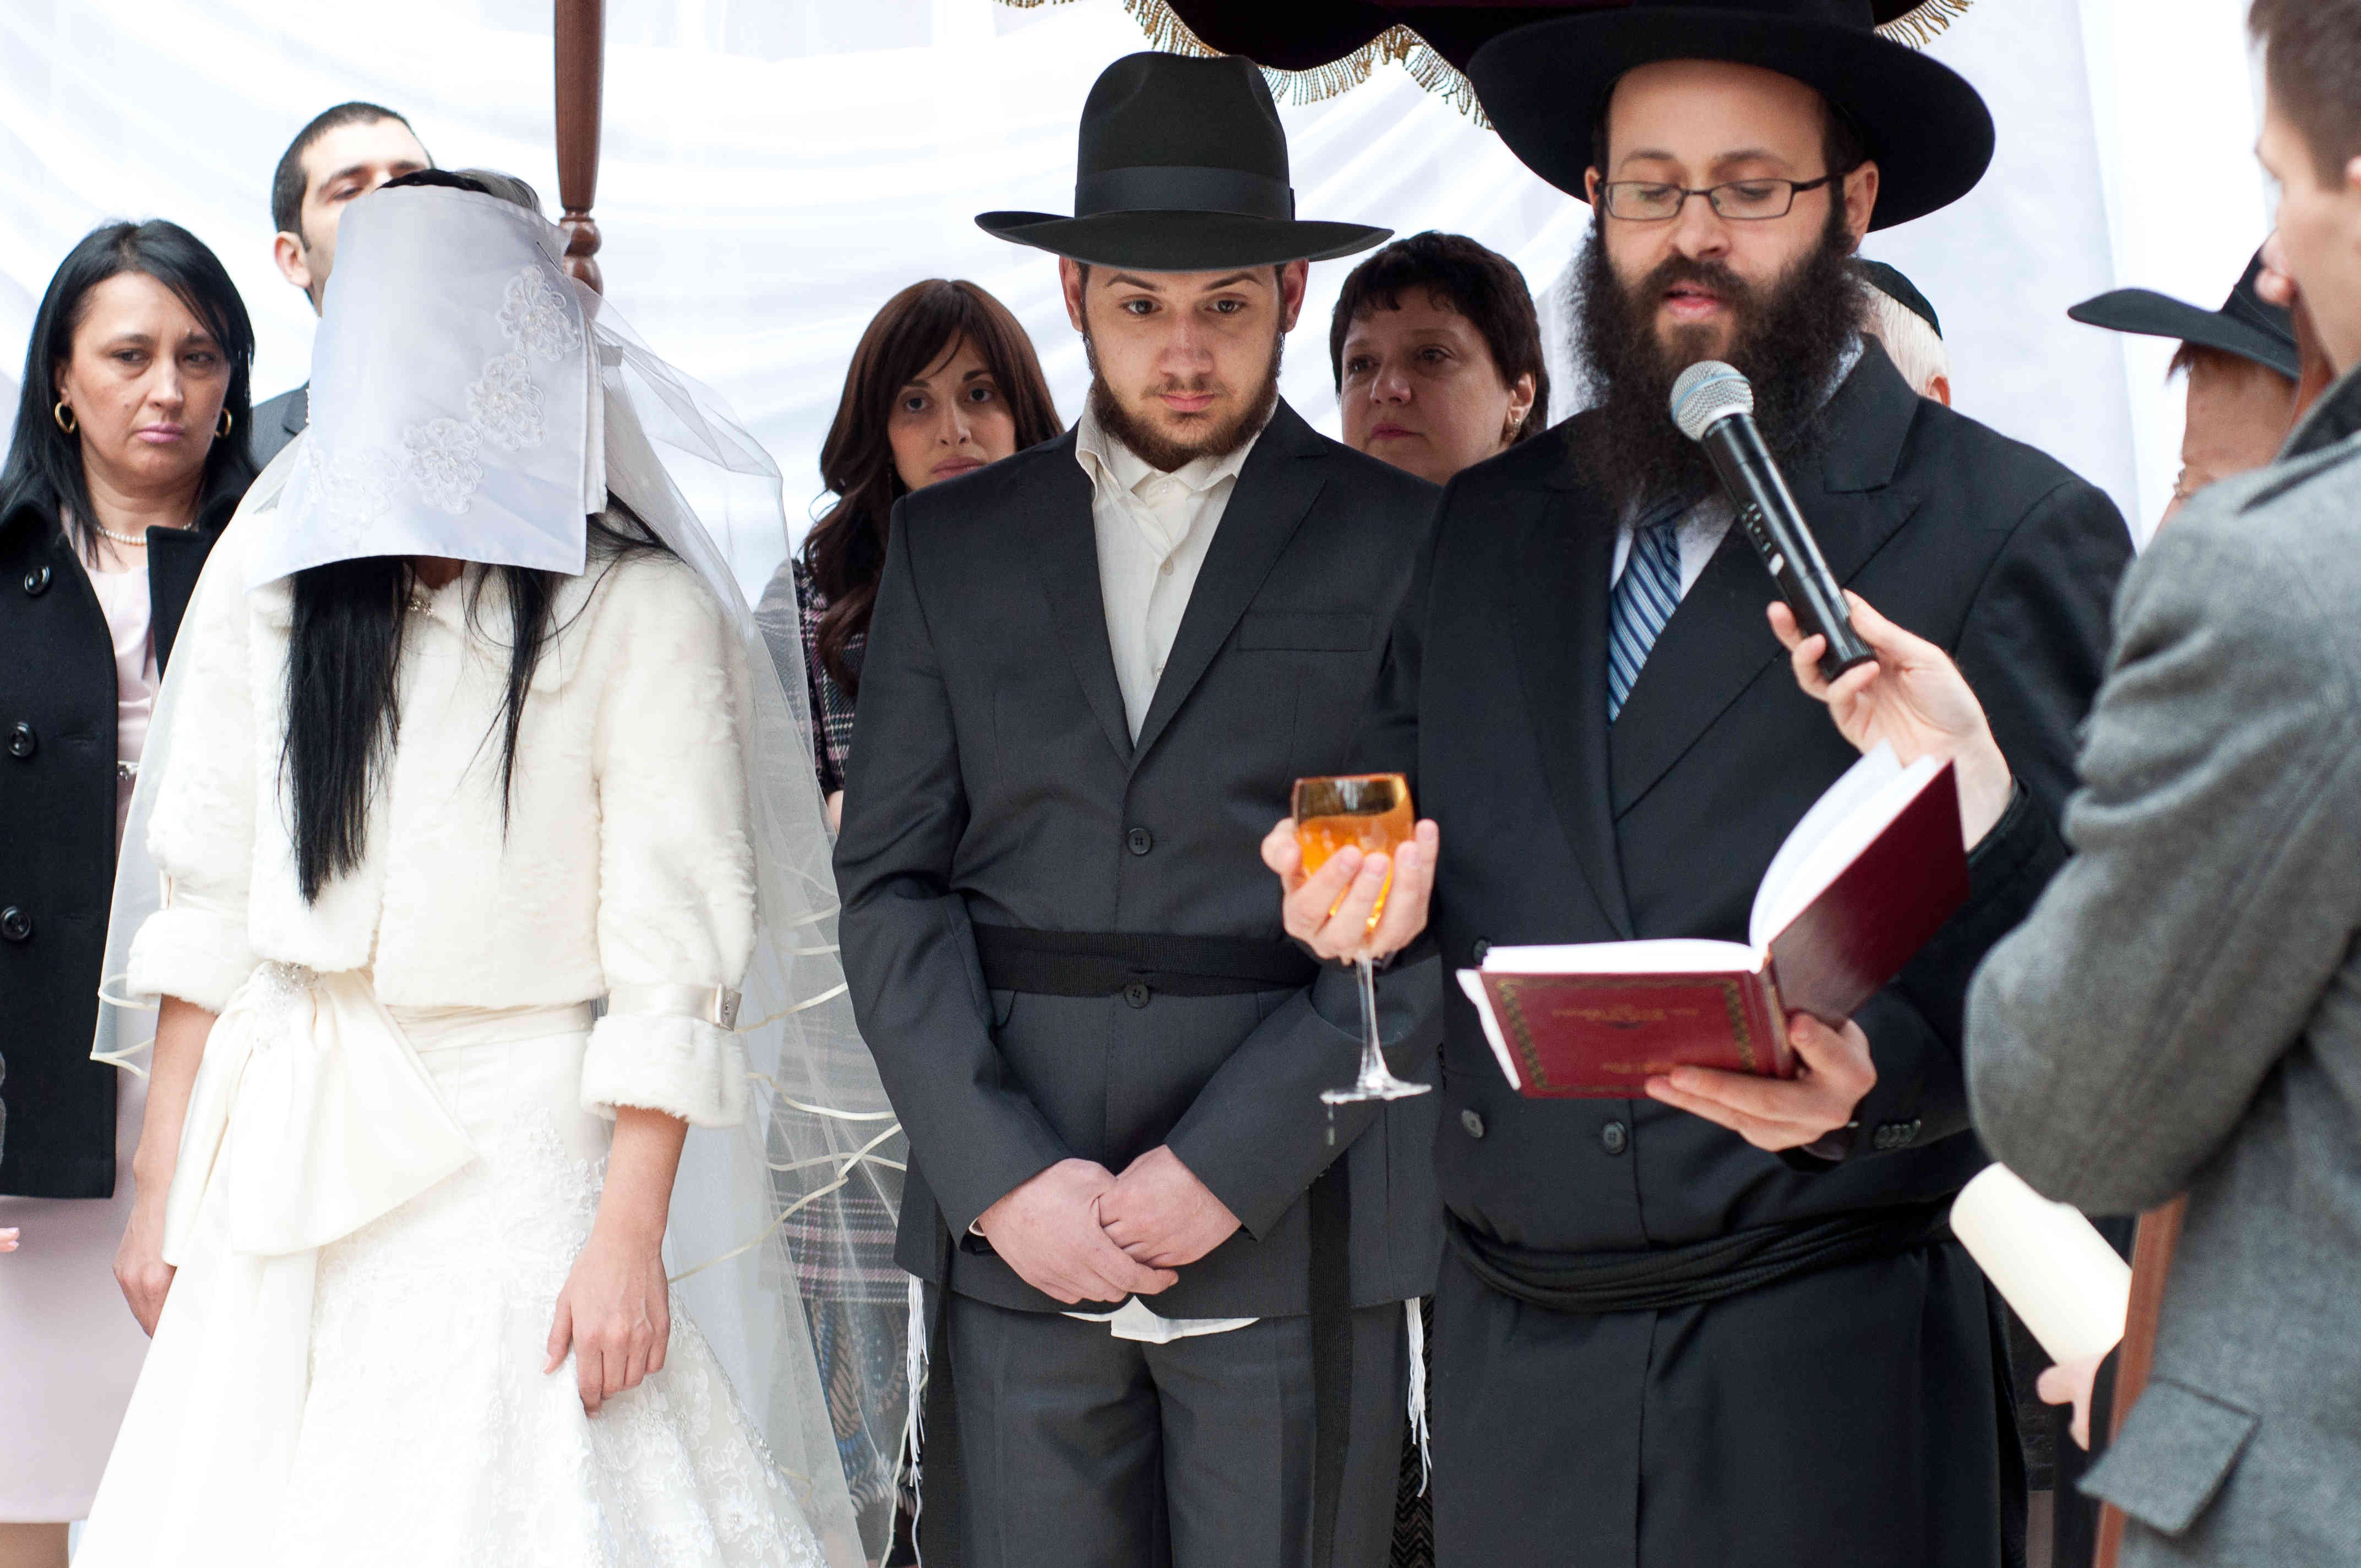 http://www.happymigration.com/wp-content/uploads/2015/02/jewish-wedding1.jpg